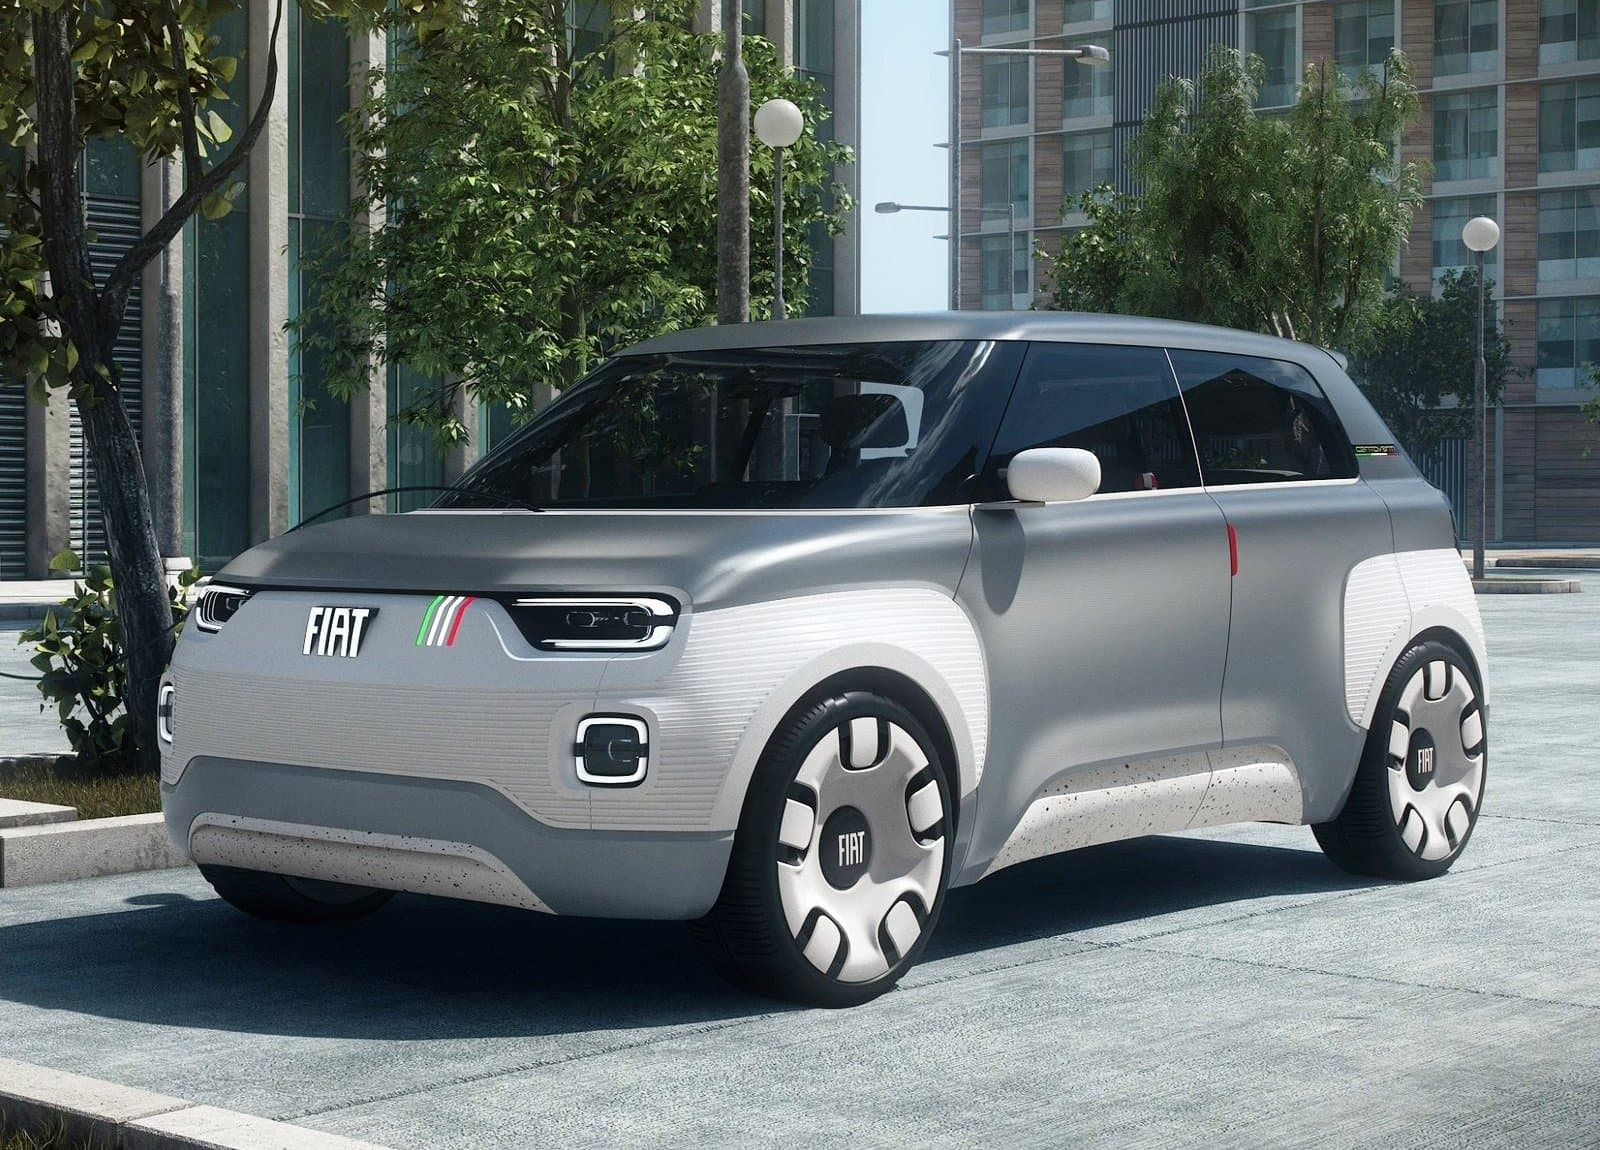 Fiat Centoventi Concept front three quarter view